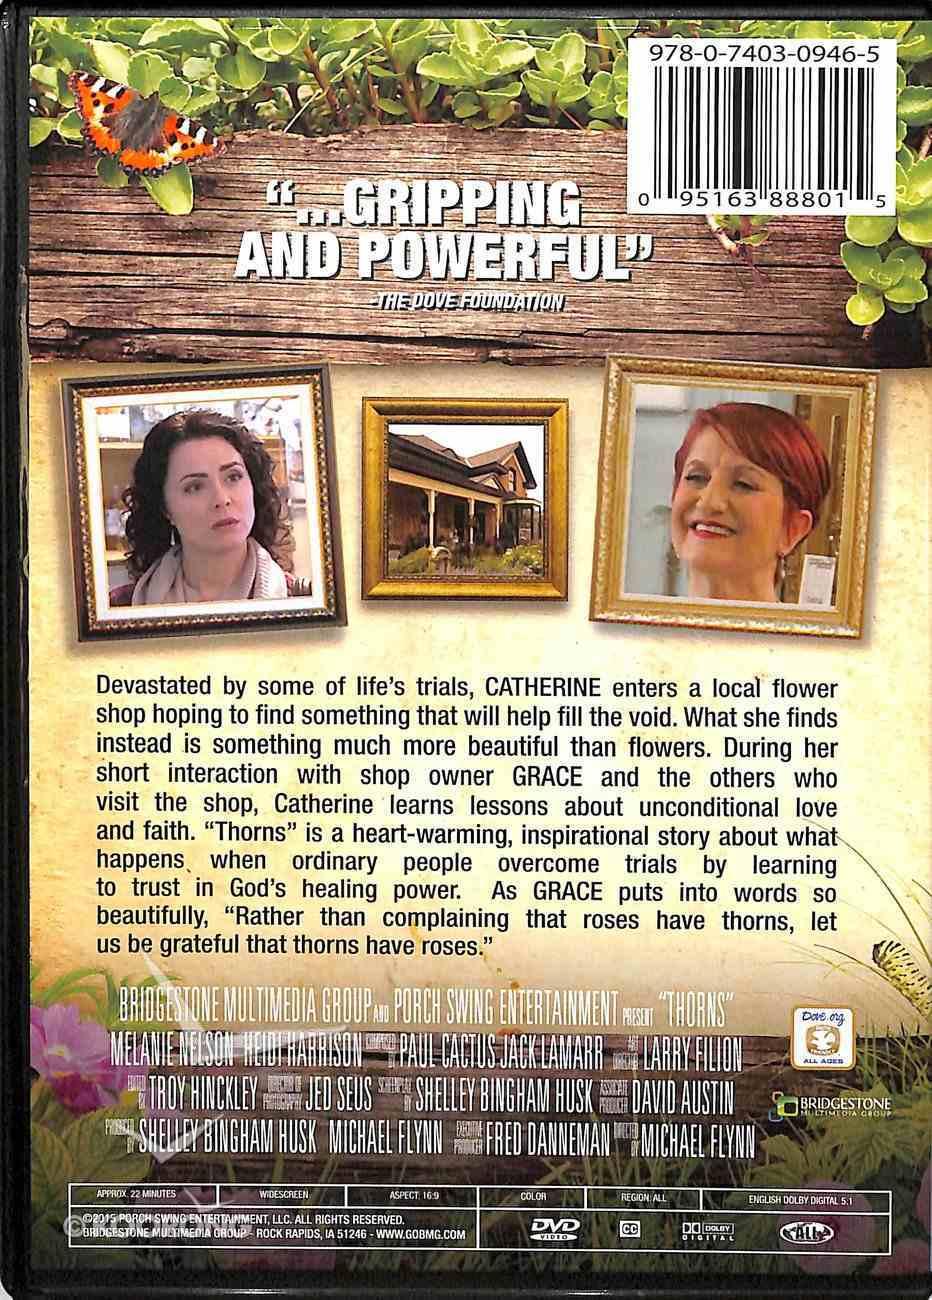 Thorns DVD